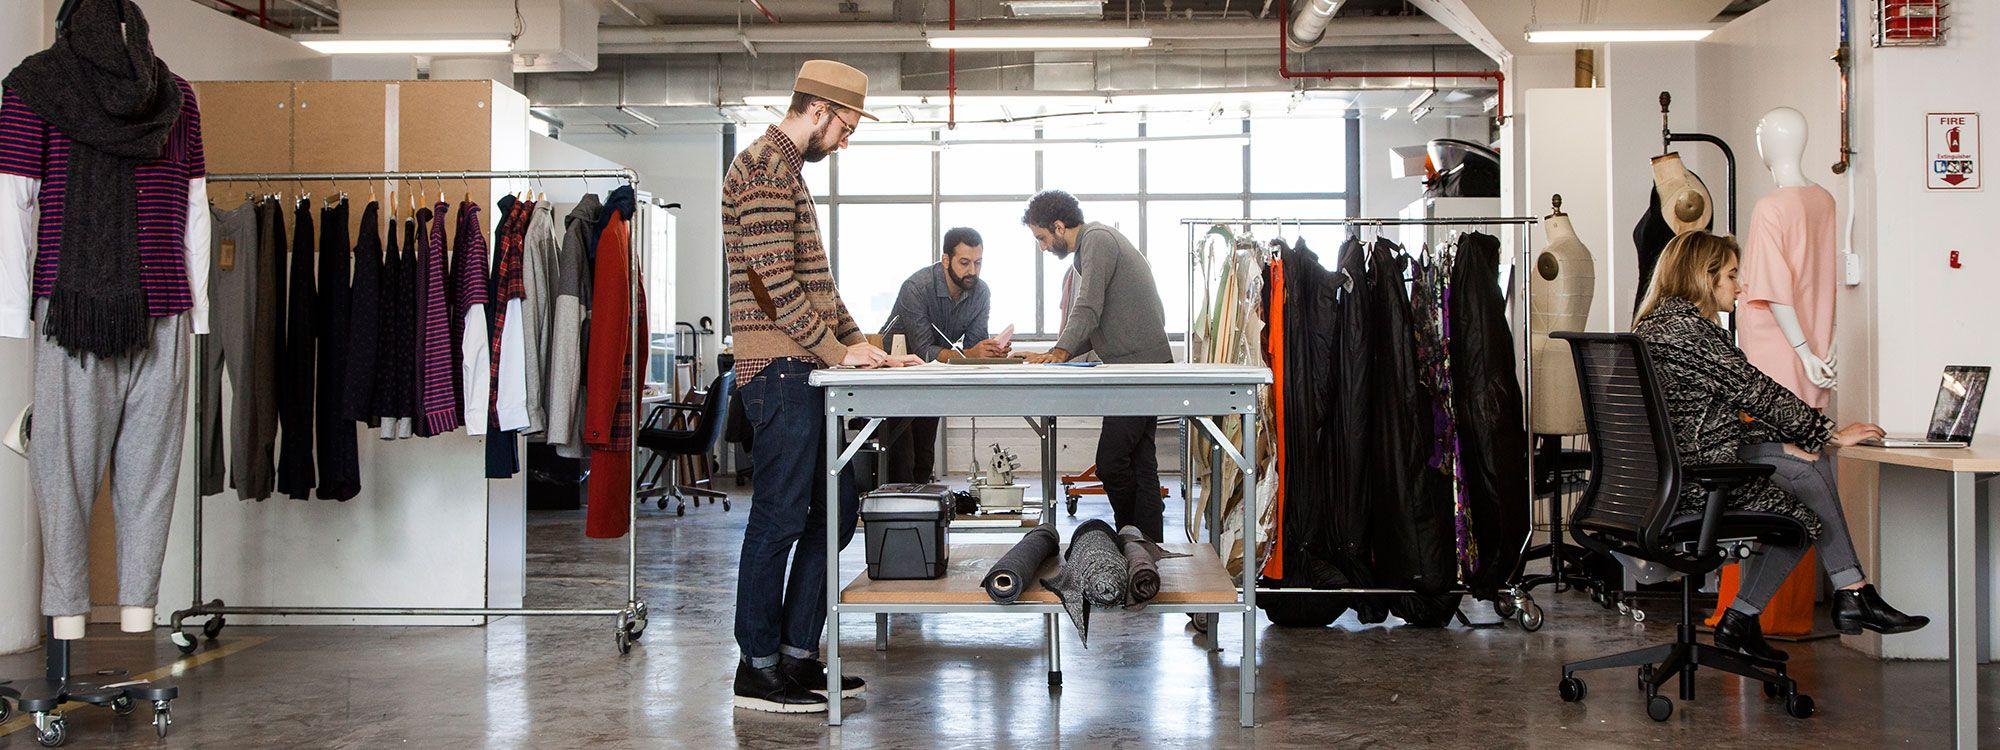 Make The Future Here Brooklyn Fashion Design Accelerator Fashion Design Design Ethical Sustainable Fashion